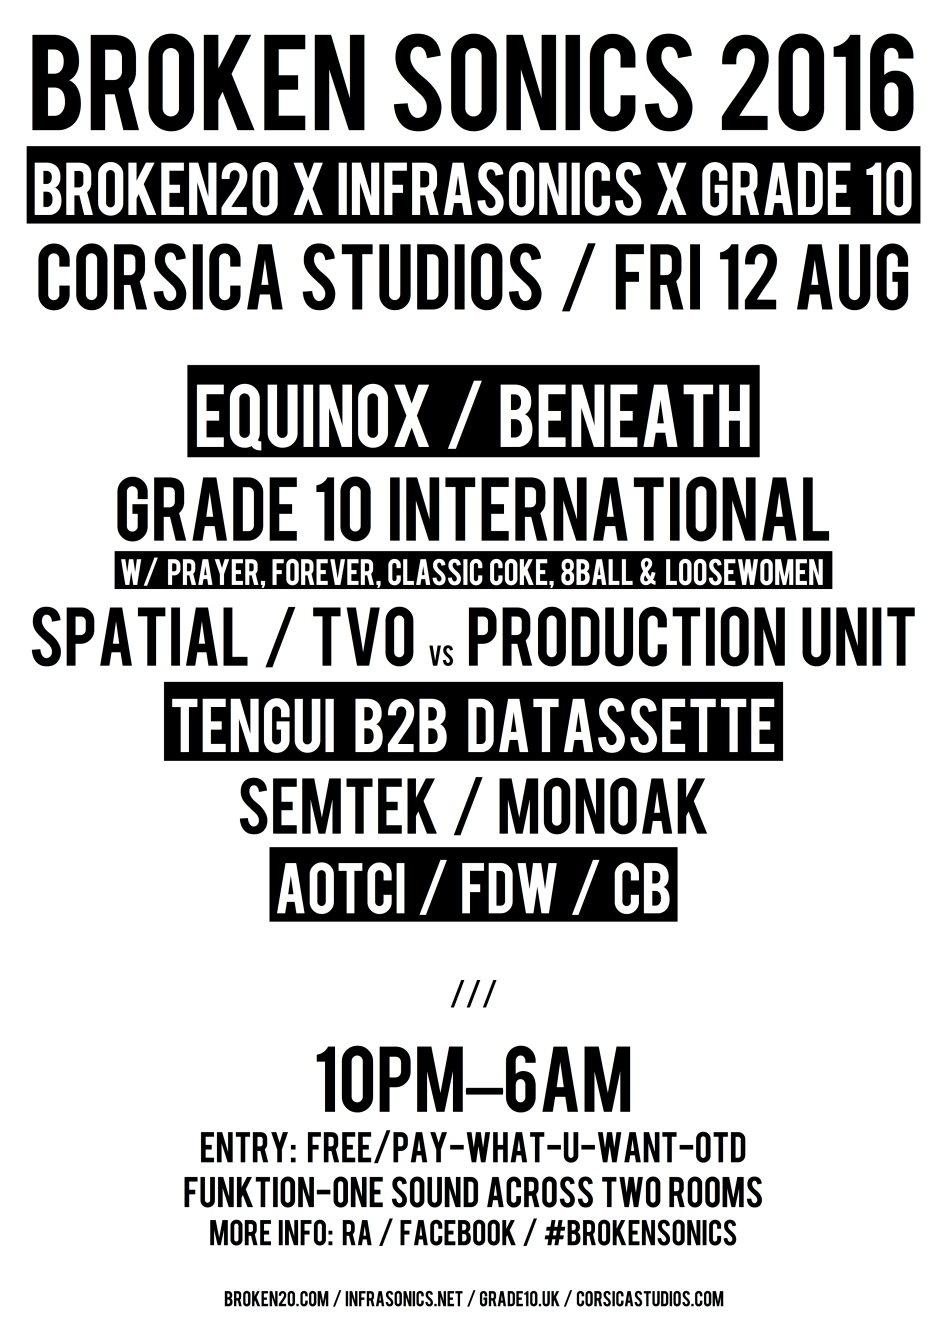 RA: Broken Sonics 2016 at Corsica Studios, London (2016)